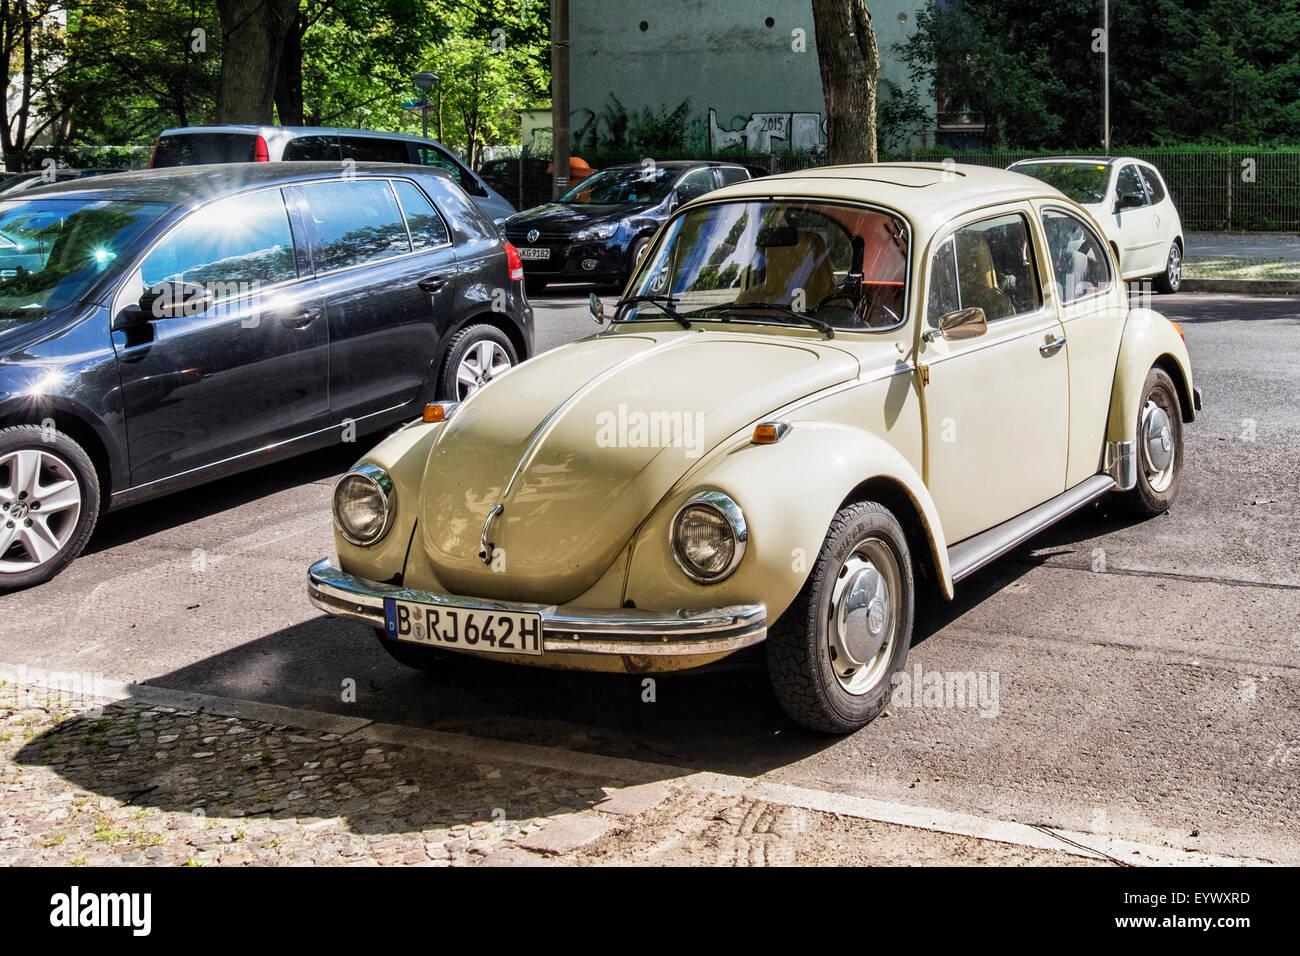 Vintage classic Volkswagen beetle motor car parked in Berlin street - Stock Image